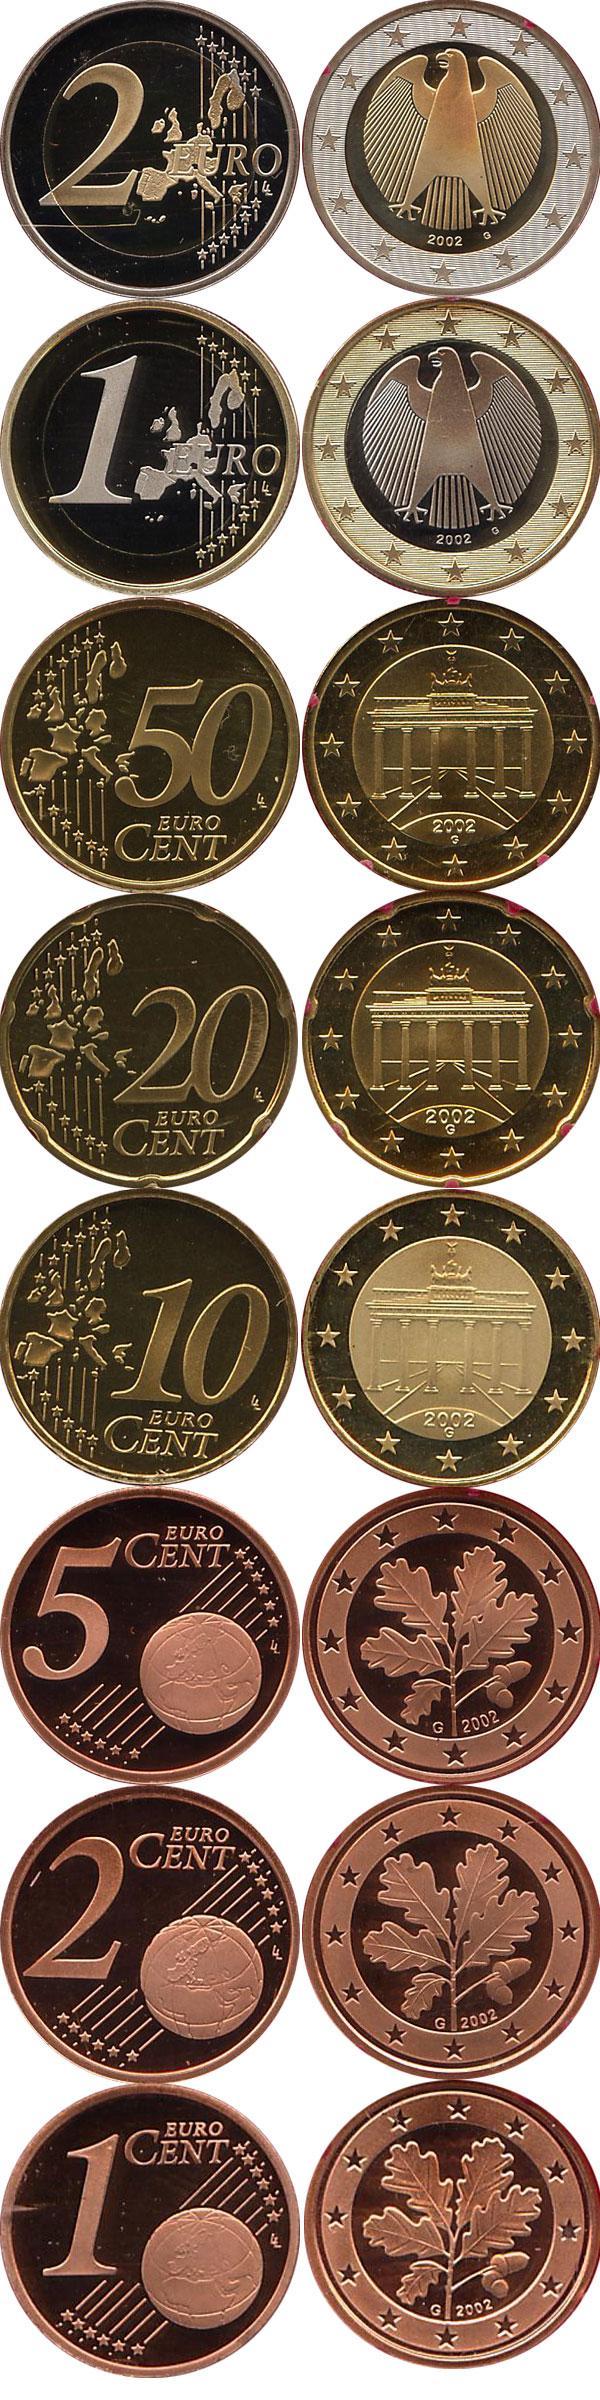 Каталог монет - Германия Выпуск 2002 года, Чеканка Карлсруэ